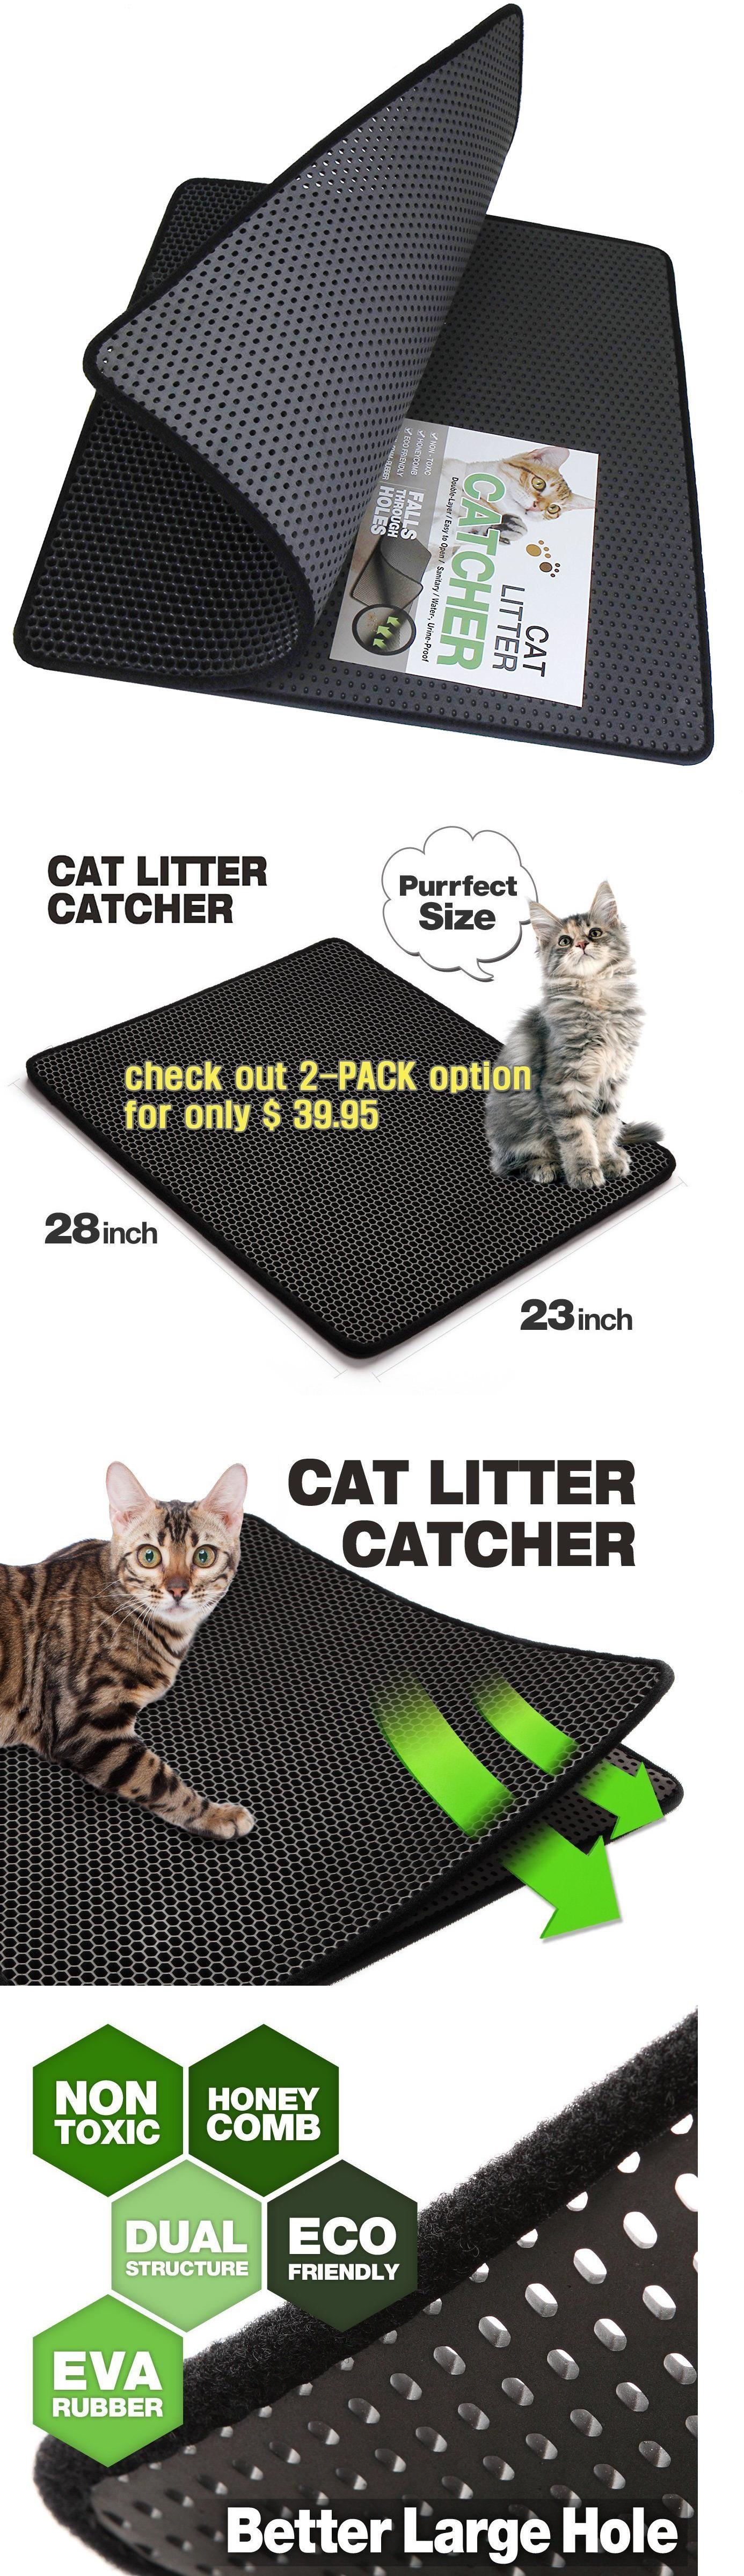 cat control count litter traps disposable com walmart box mats odor out ip